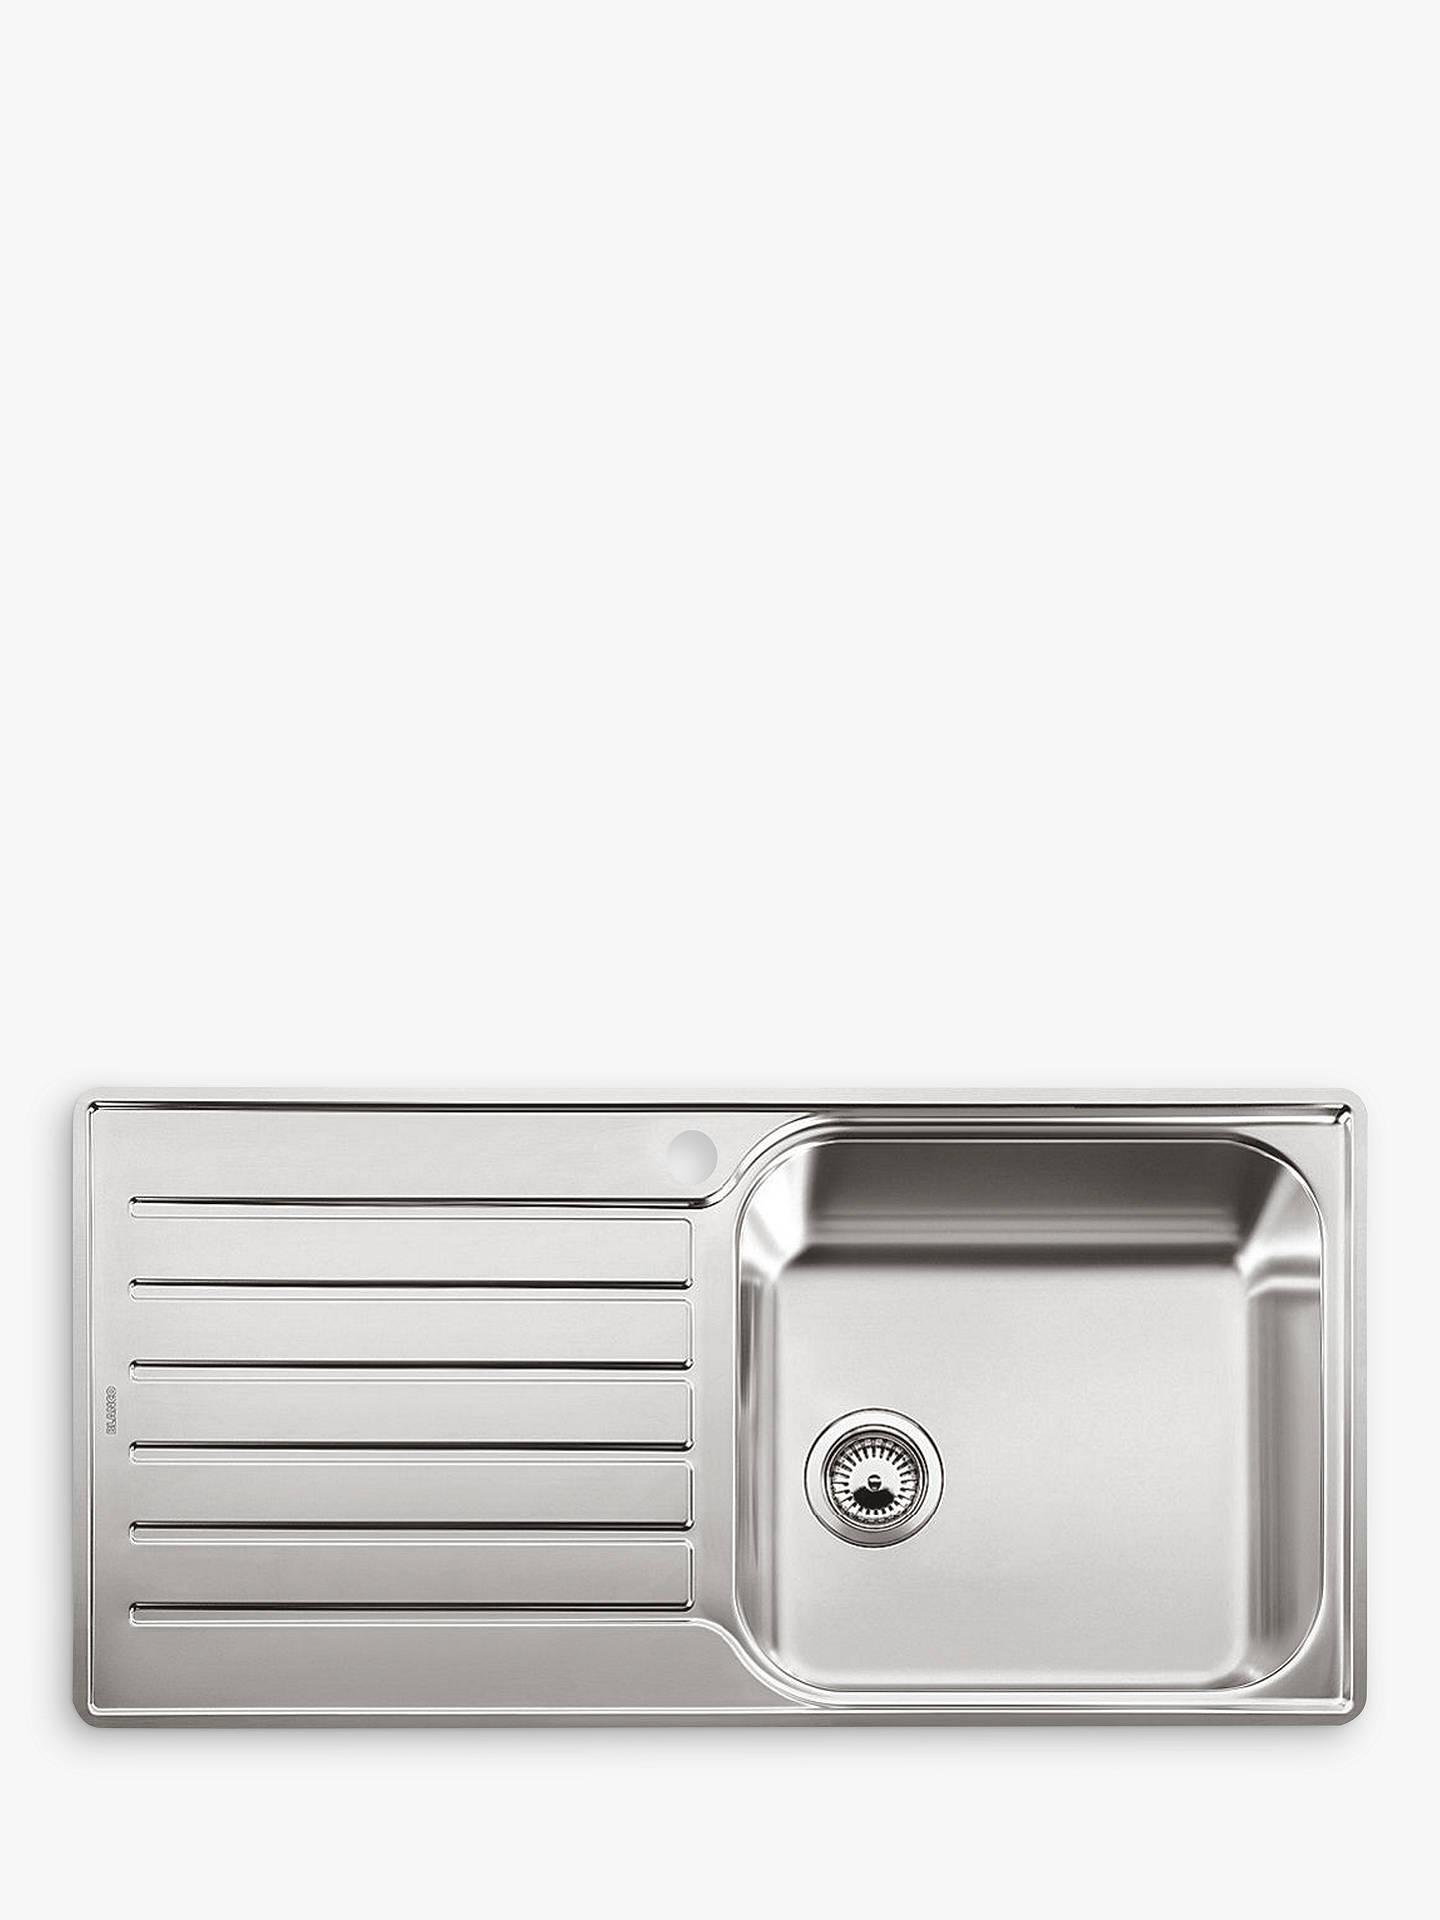 blanco lantos xl 6 s if single bowl inset kitchen sink stainless steel at john lewis partners. Black Bedroom Furniture Sets. Home Design Ideas